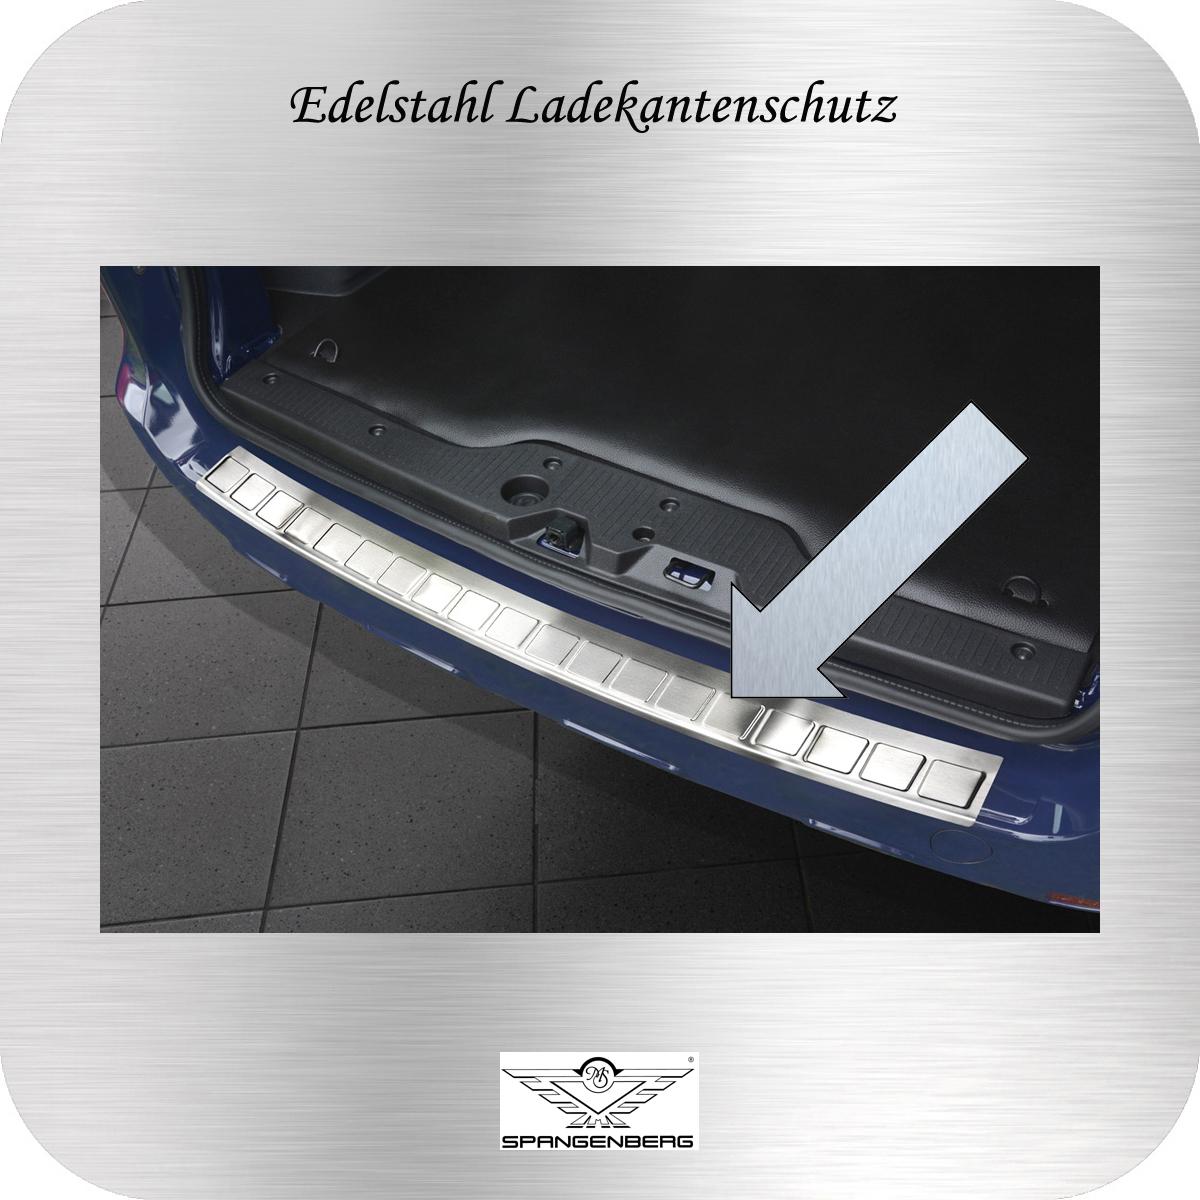 Ladekantenschutz Edelstahl Dacia Dokker Kombi 2012- ohne Aussparung 3235141